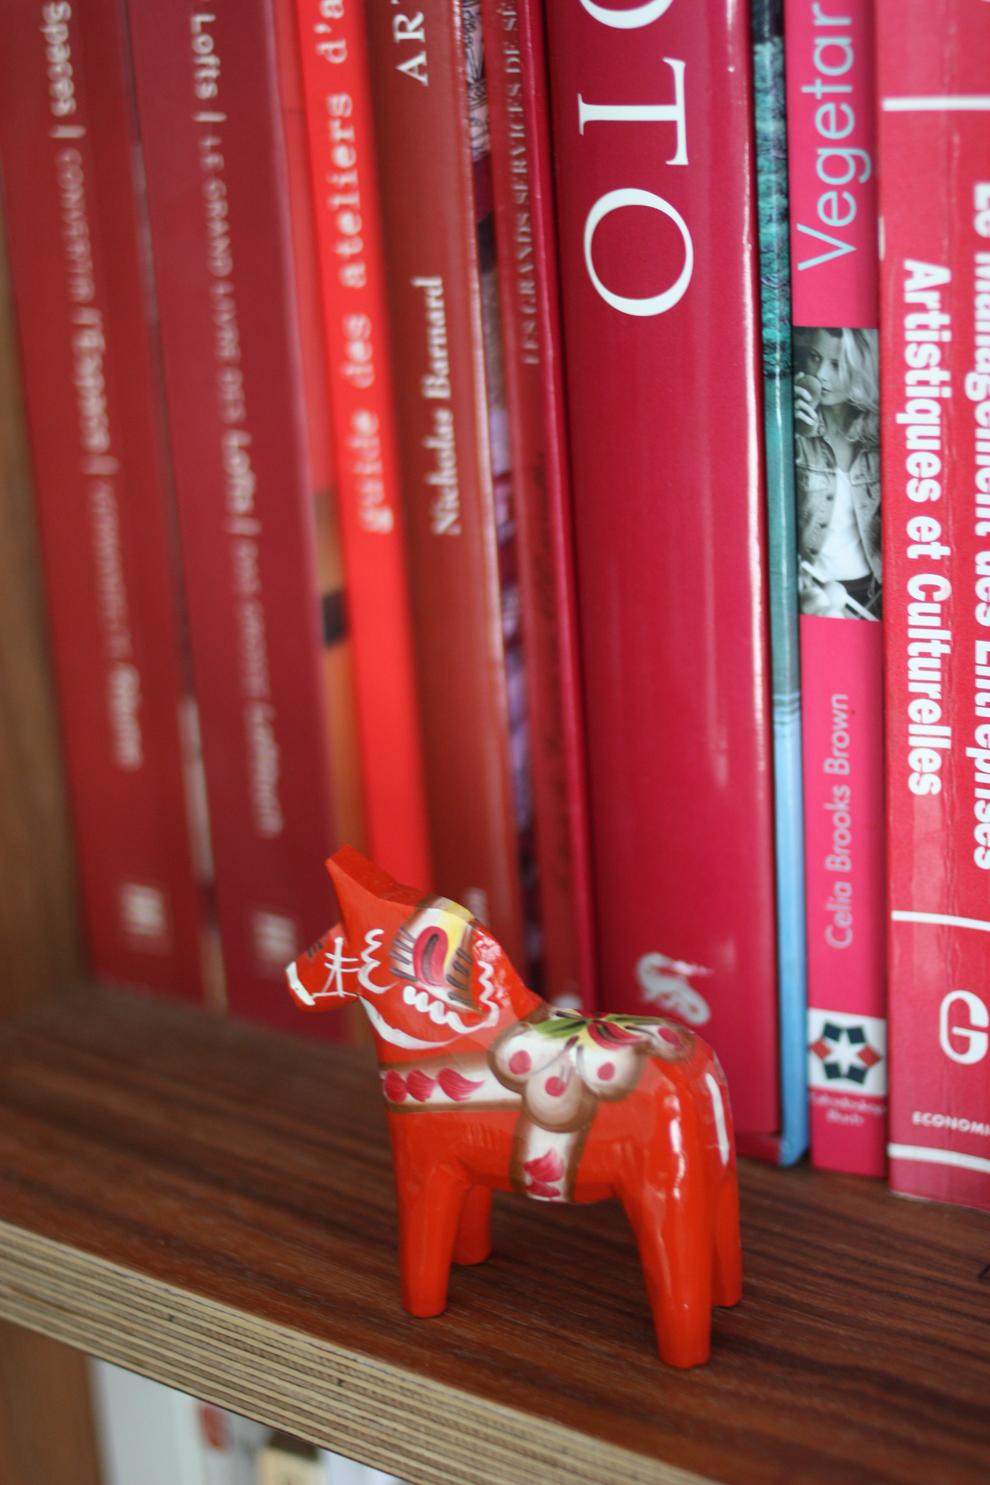 Dalahästen_on_the_bookshelf